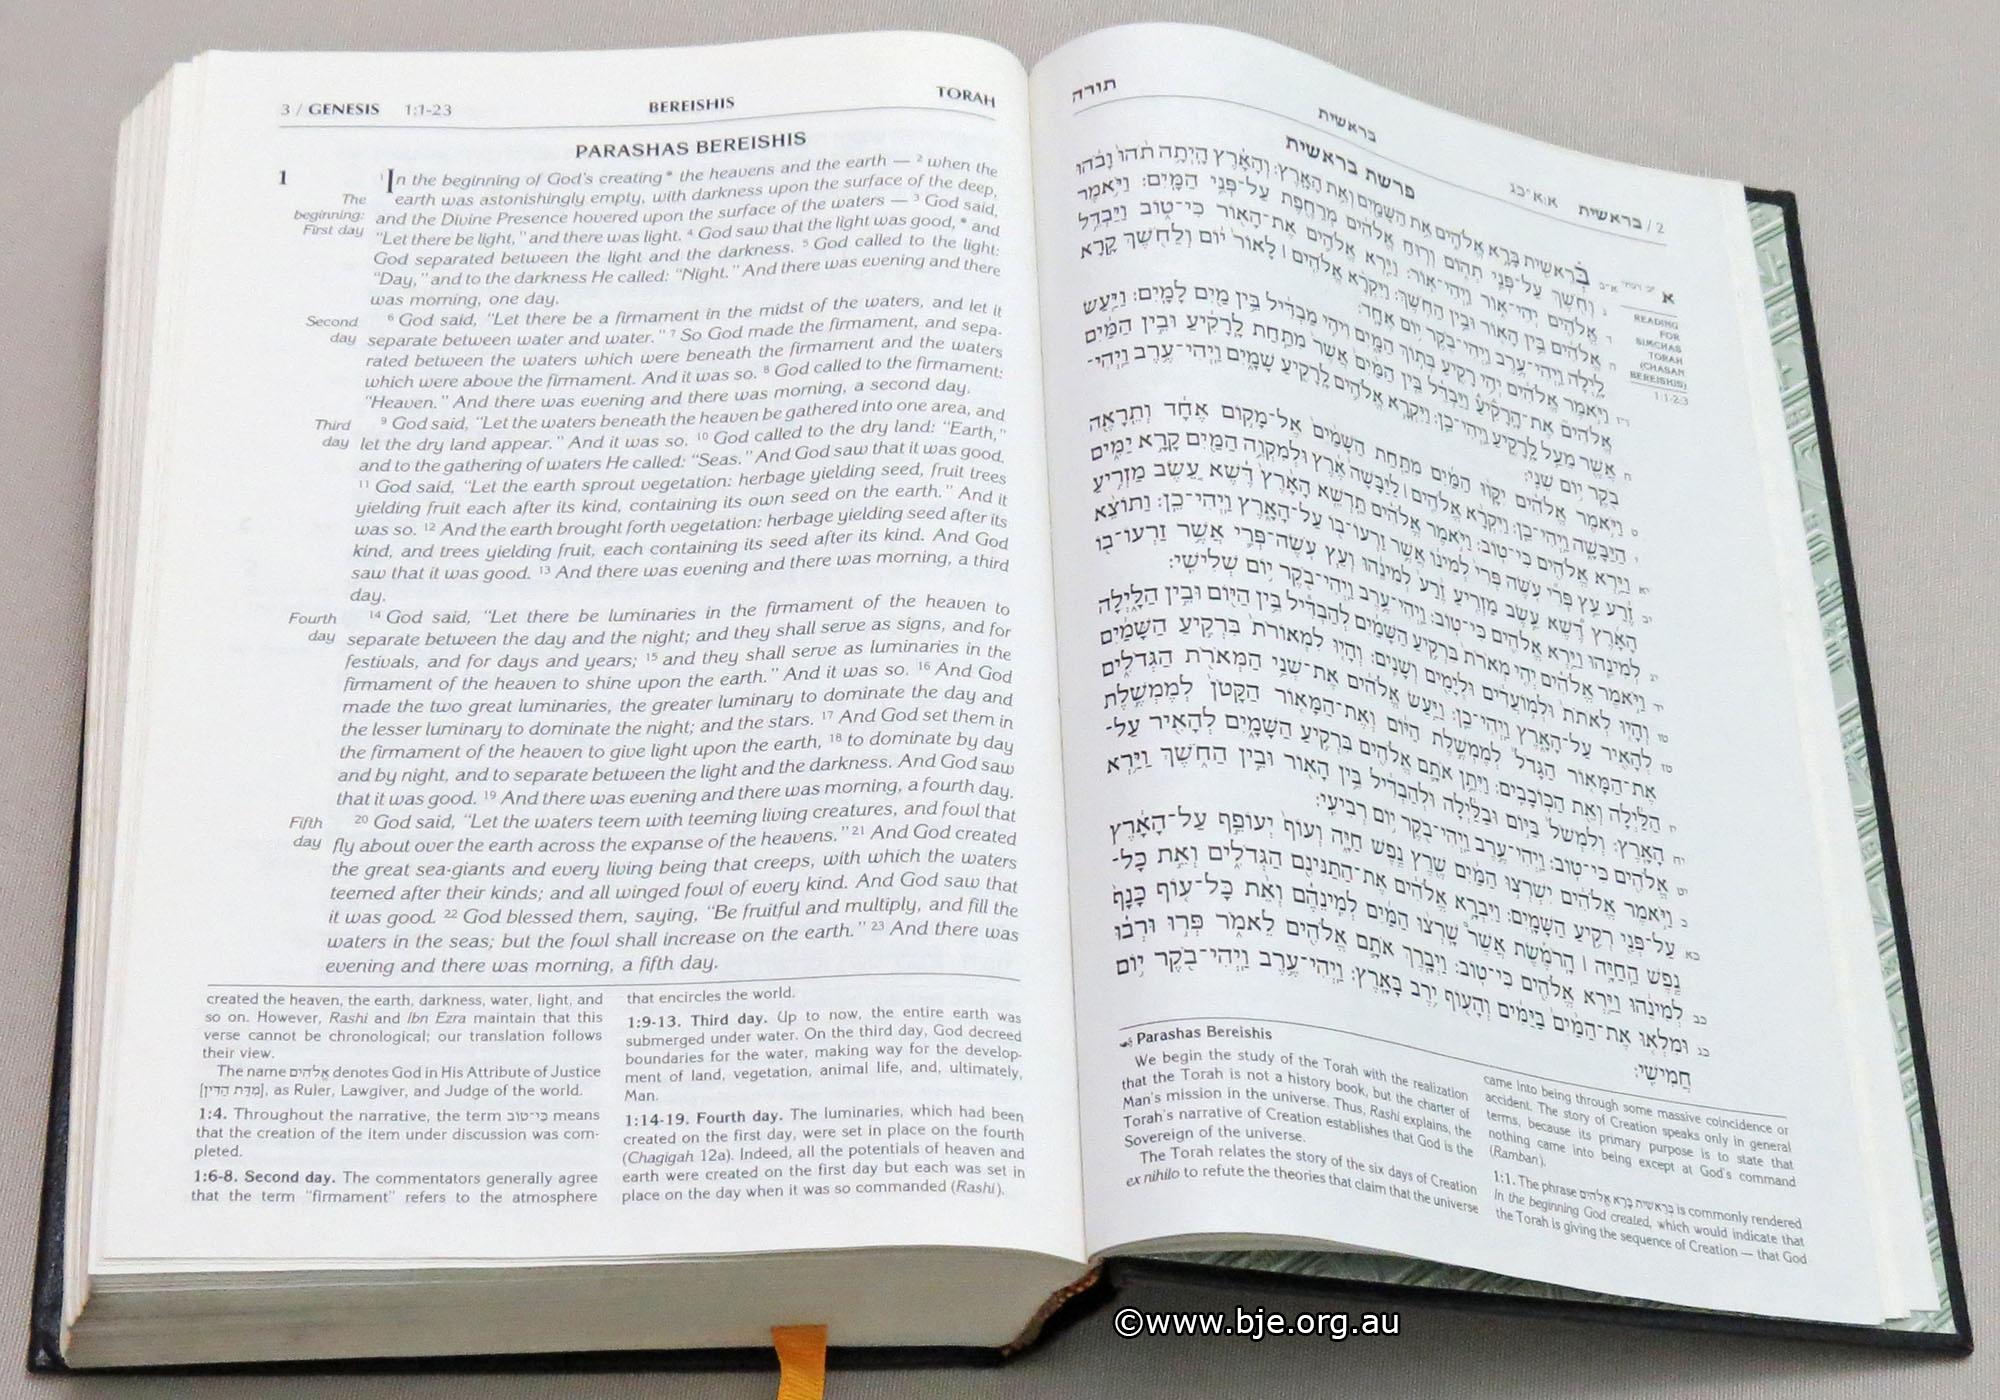 tanach jewish bible nsw board of jewish education